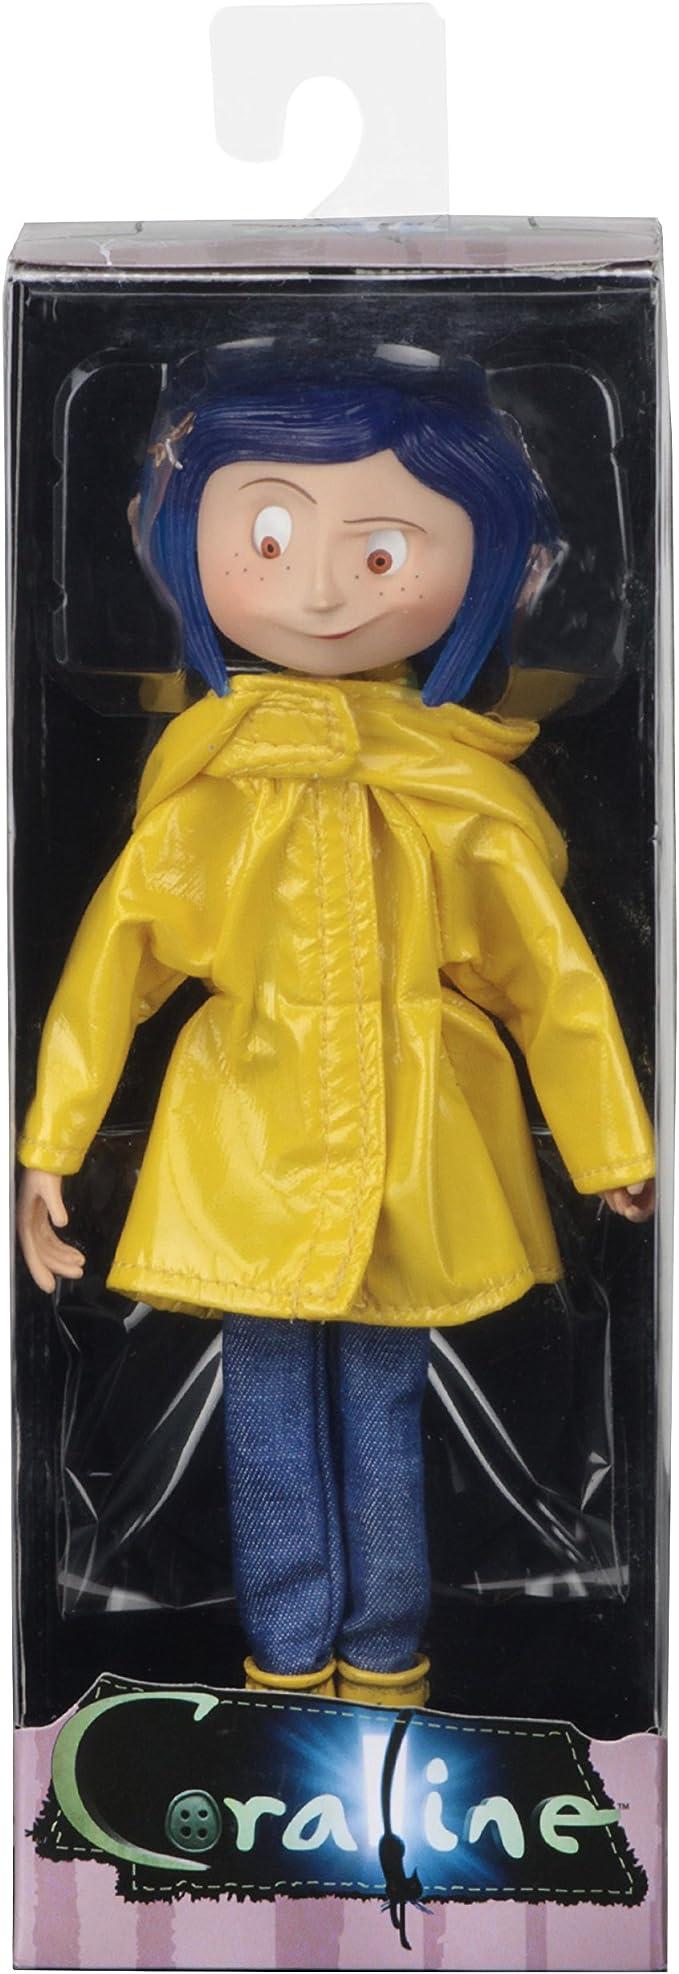 Coraline Bendy Doll Raincoats e Boots Action Figure Neca